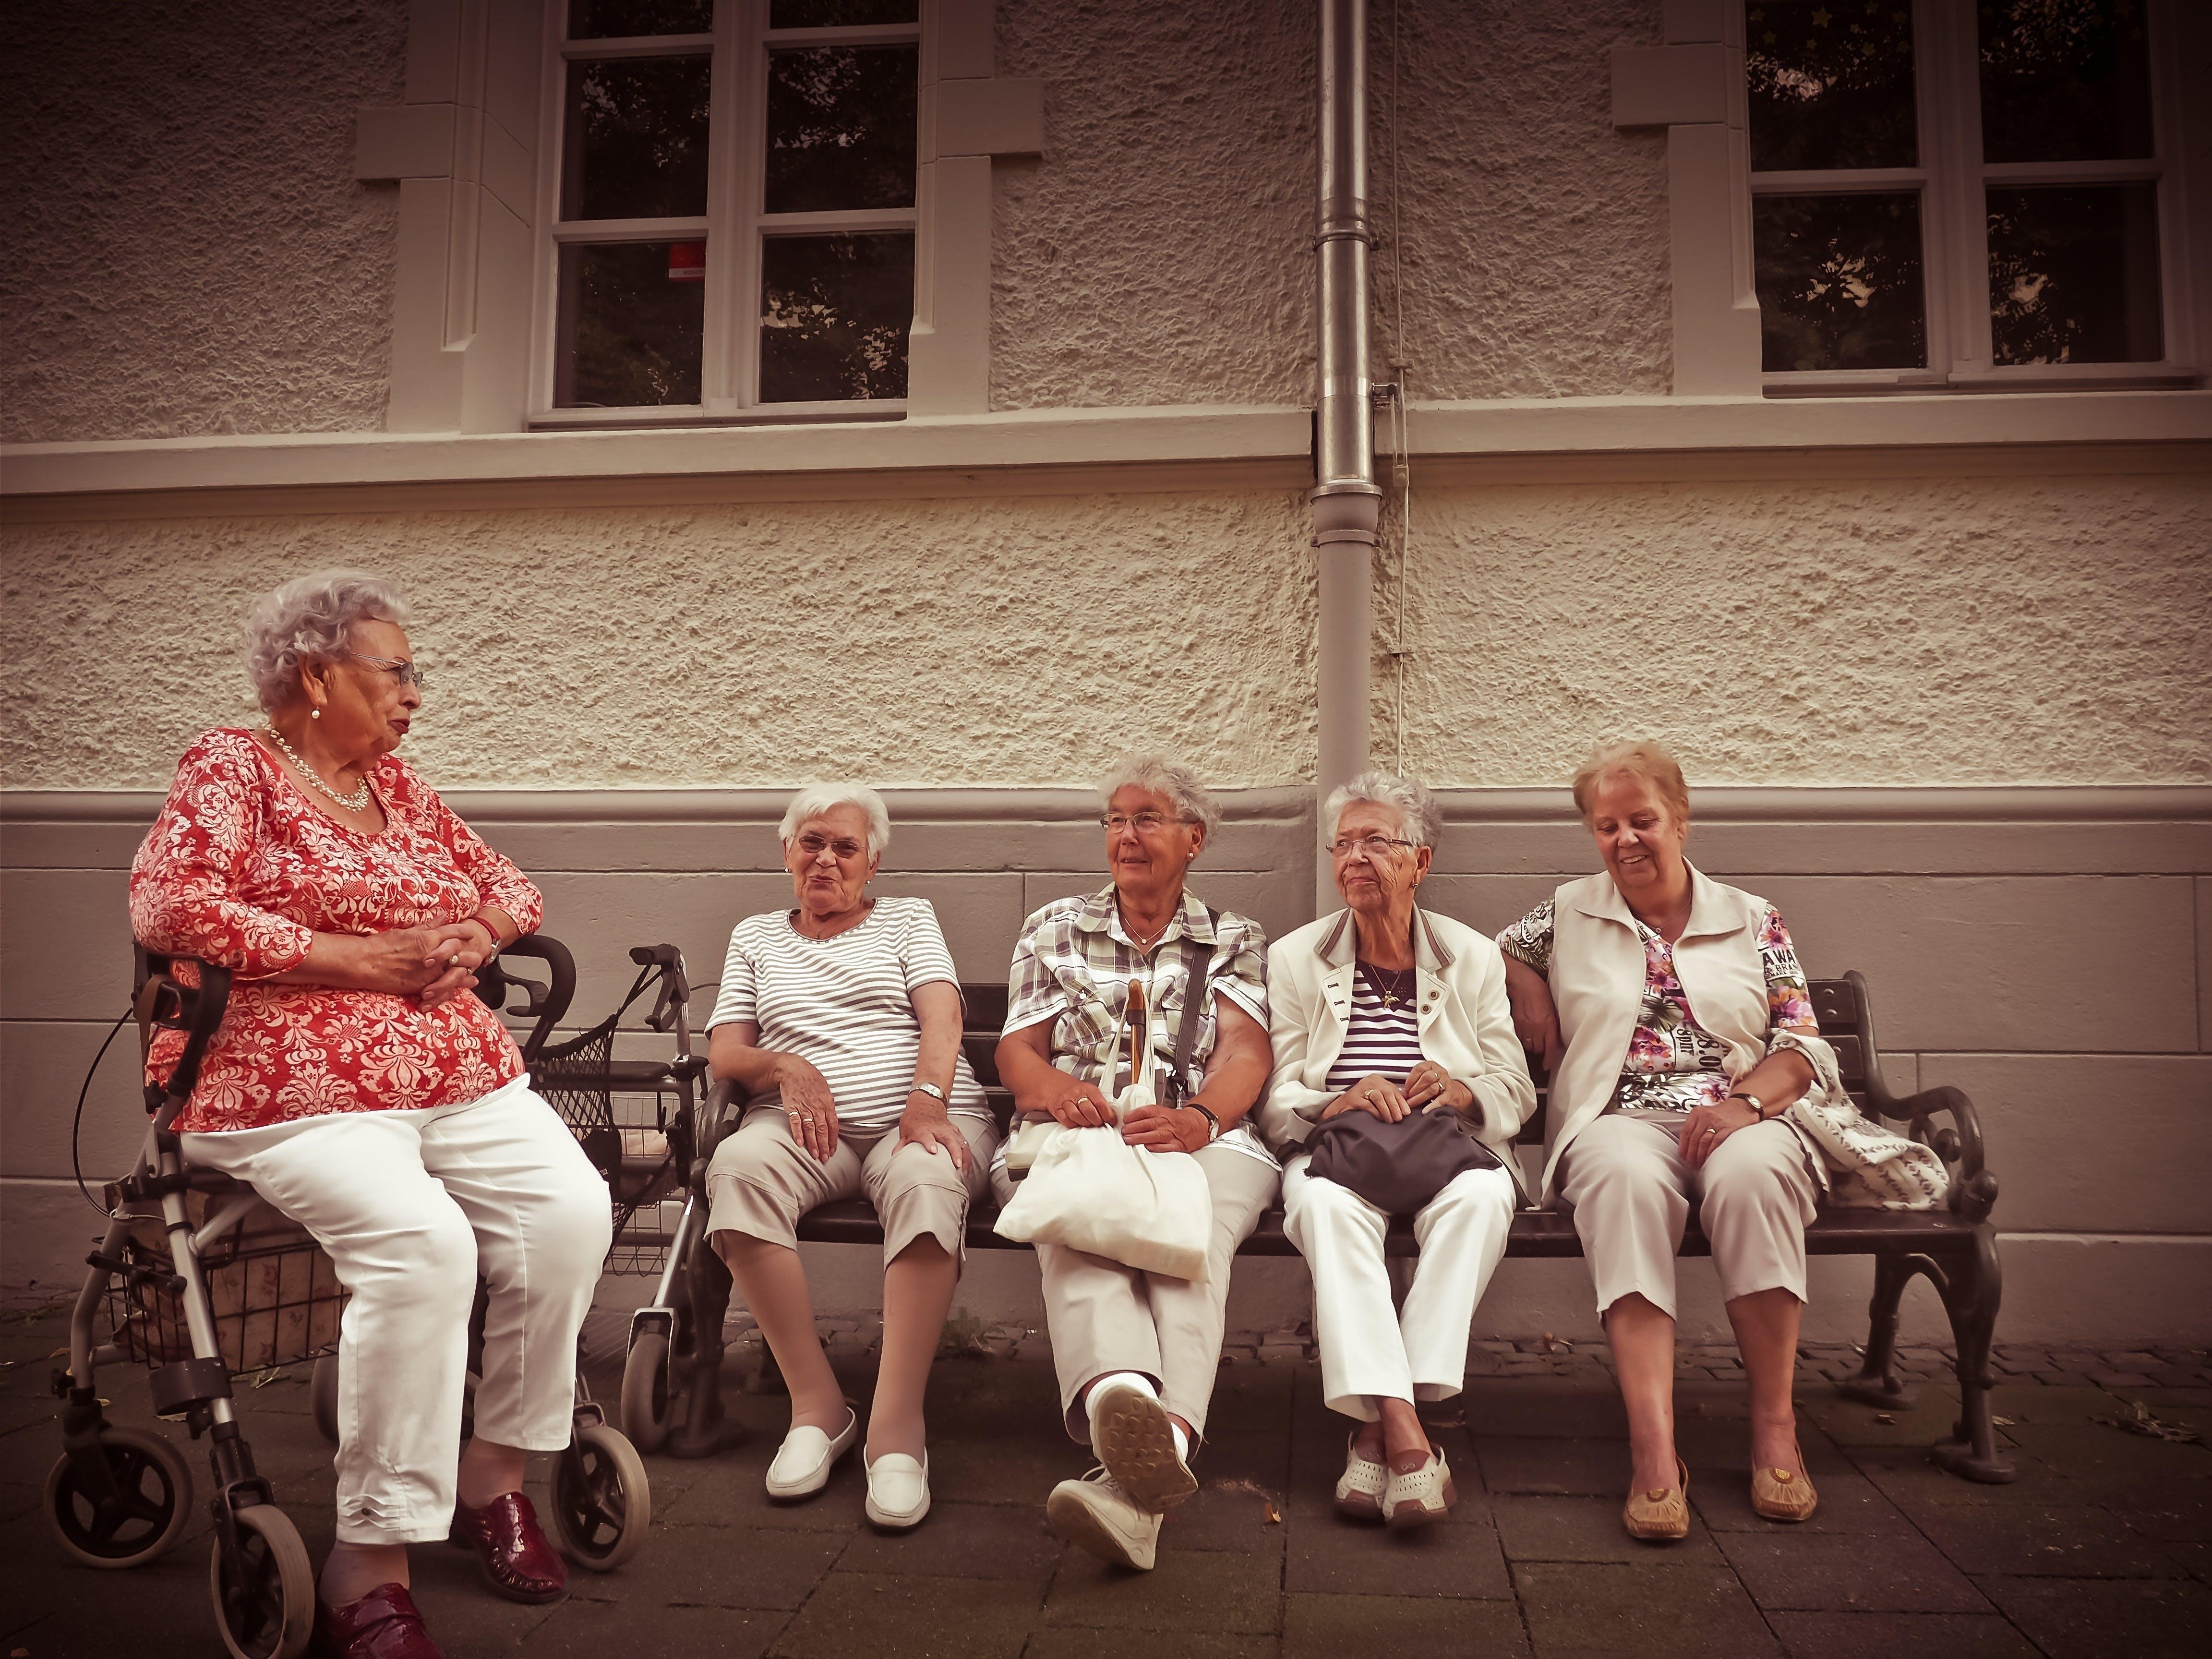 активный отдых, бабушка, веселье